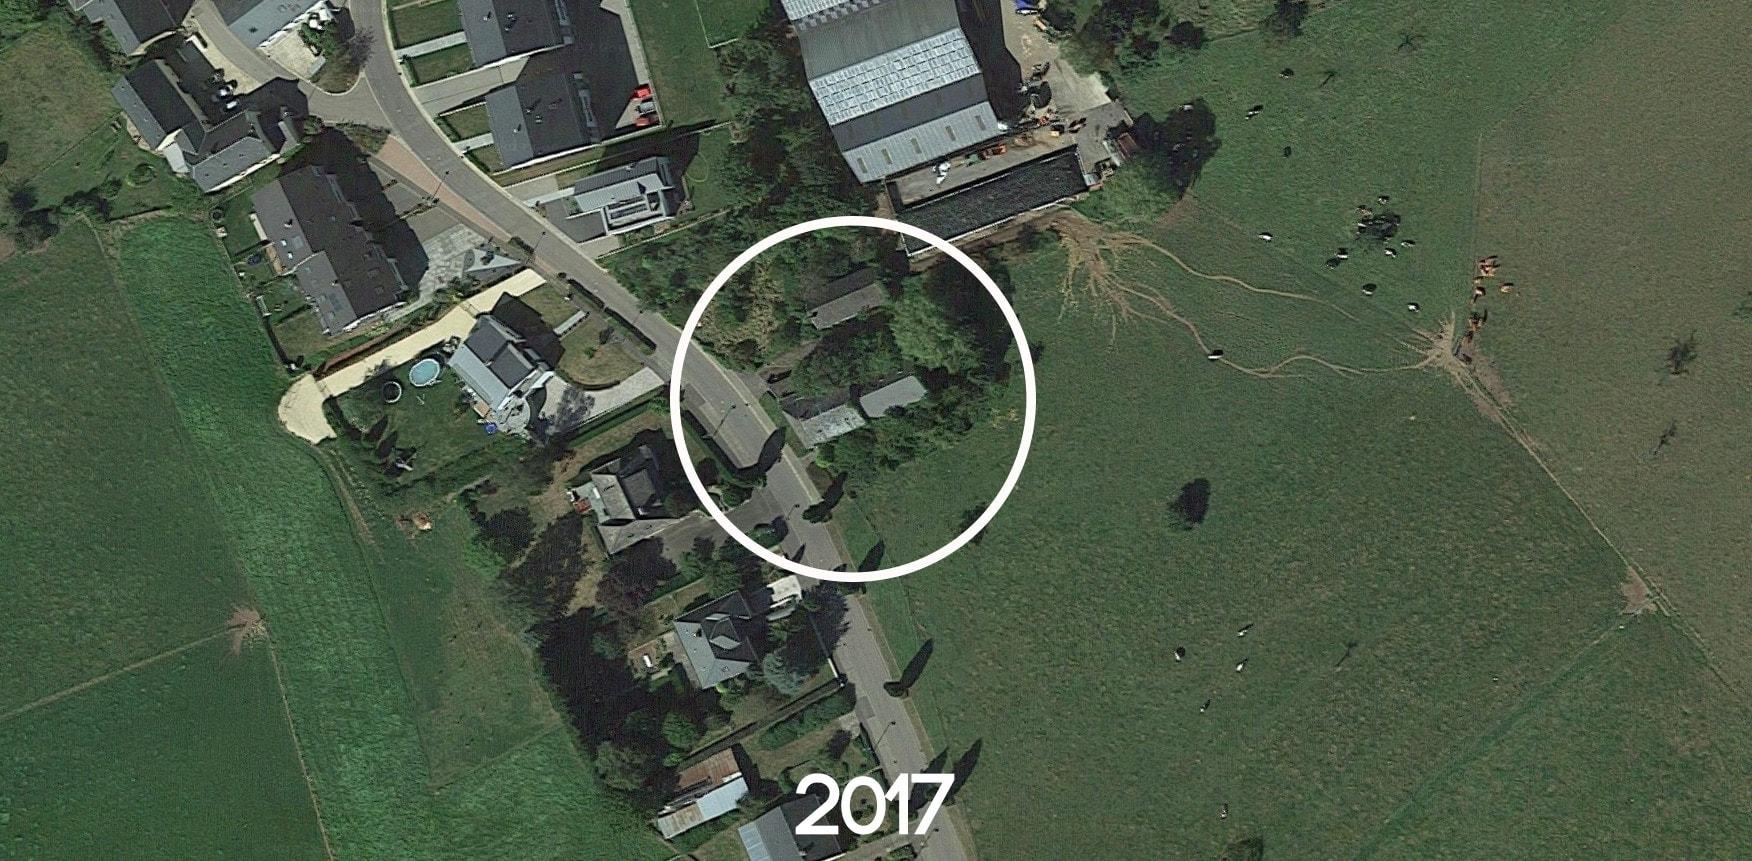 maison-judy-moran-map-2017